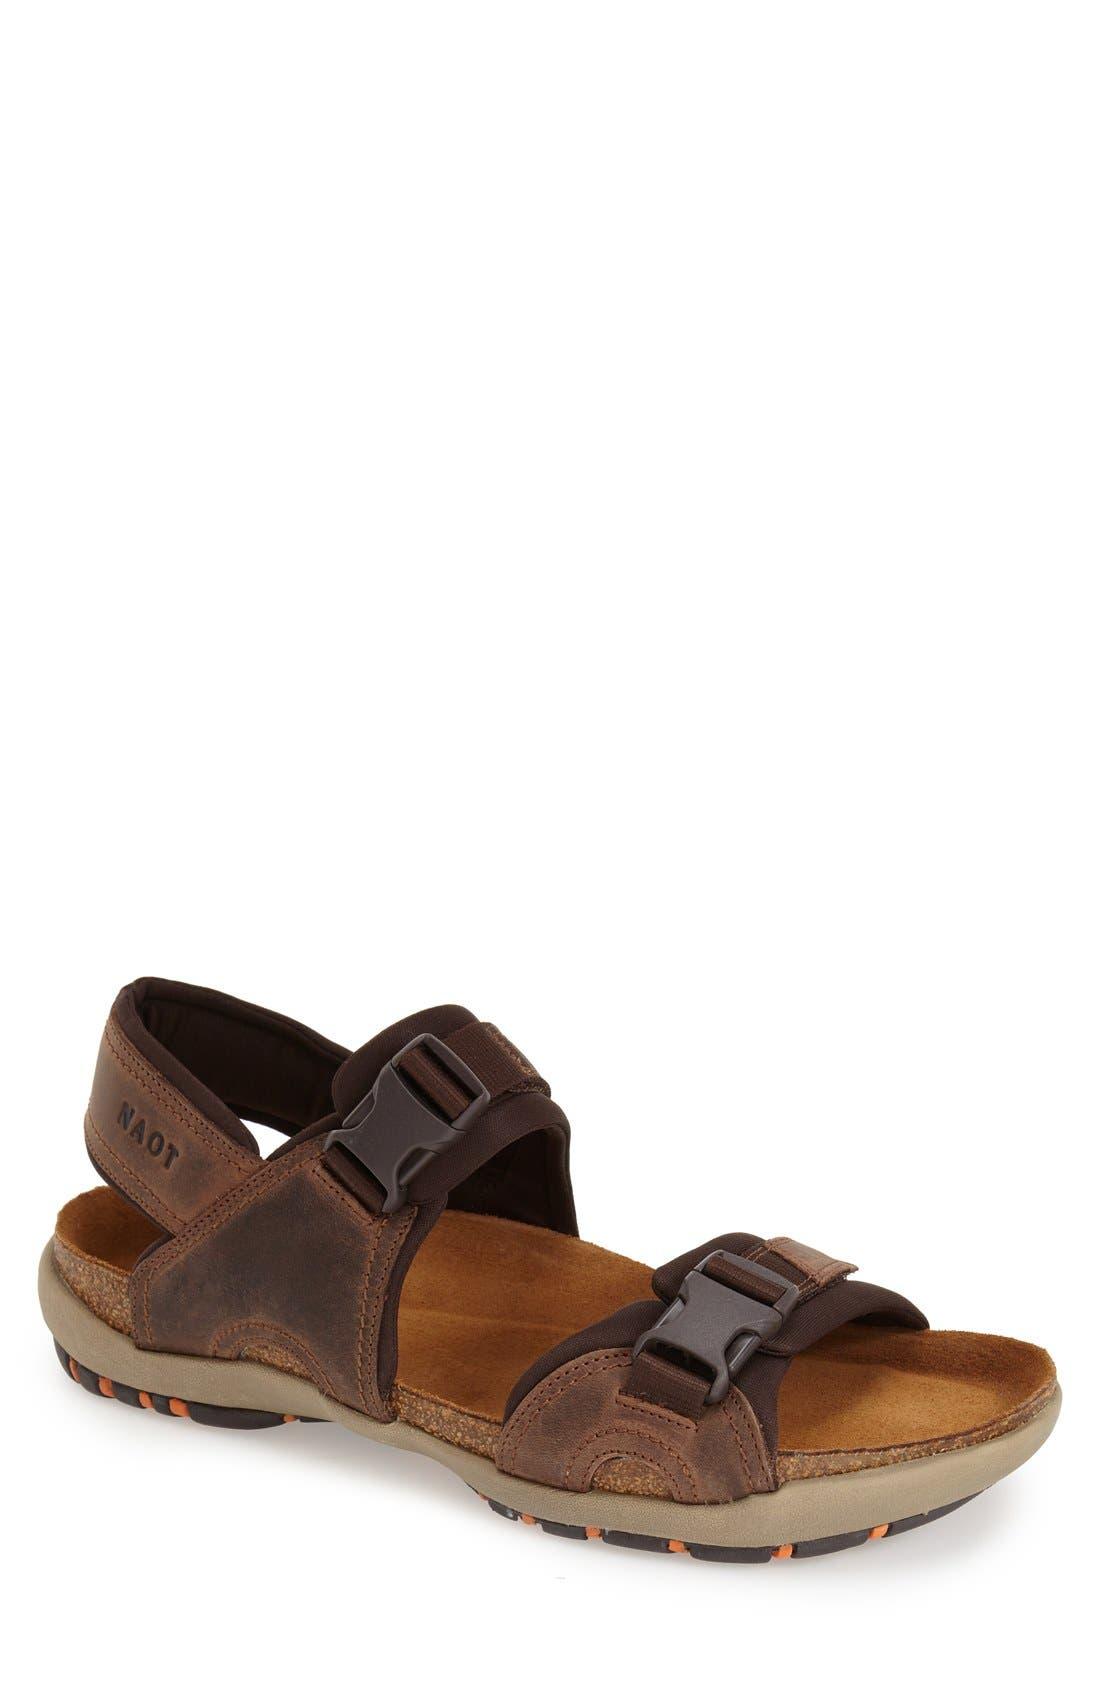 NAOT Explorer Sandal